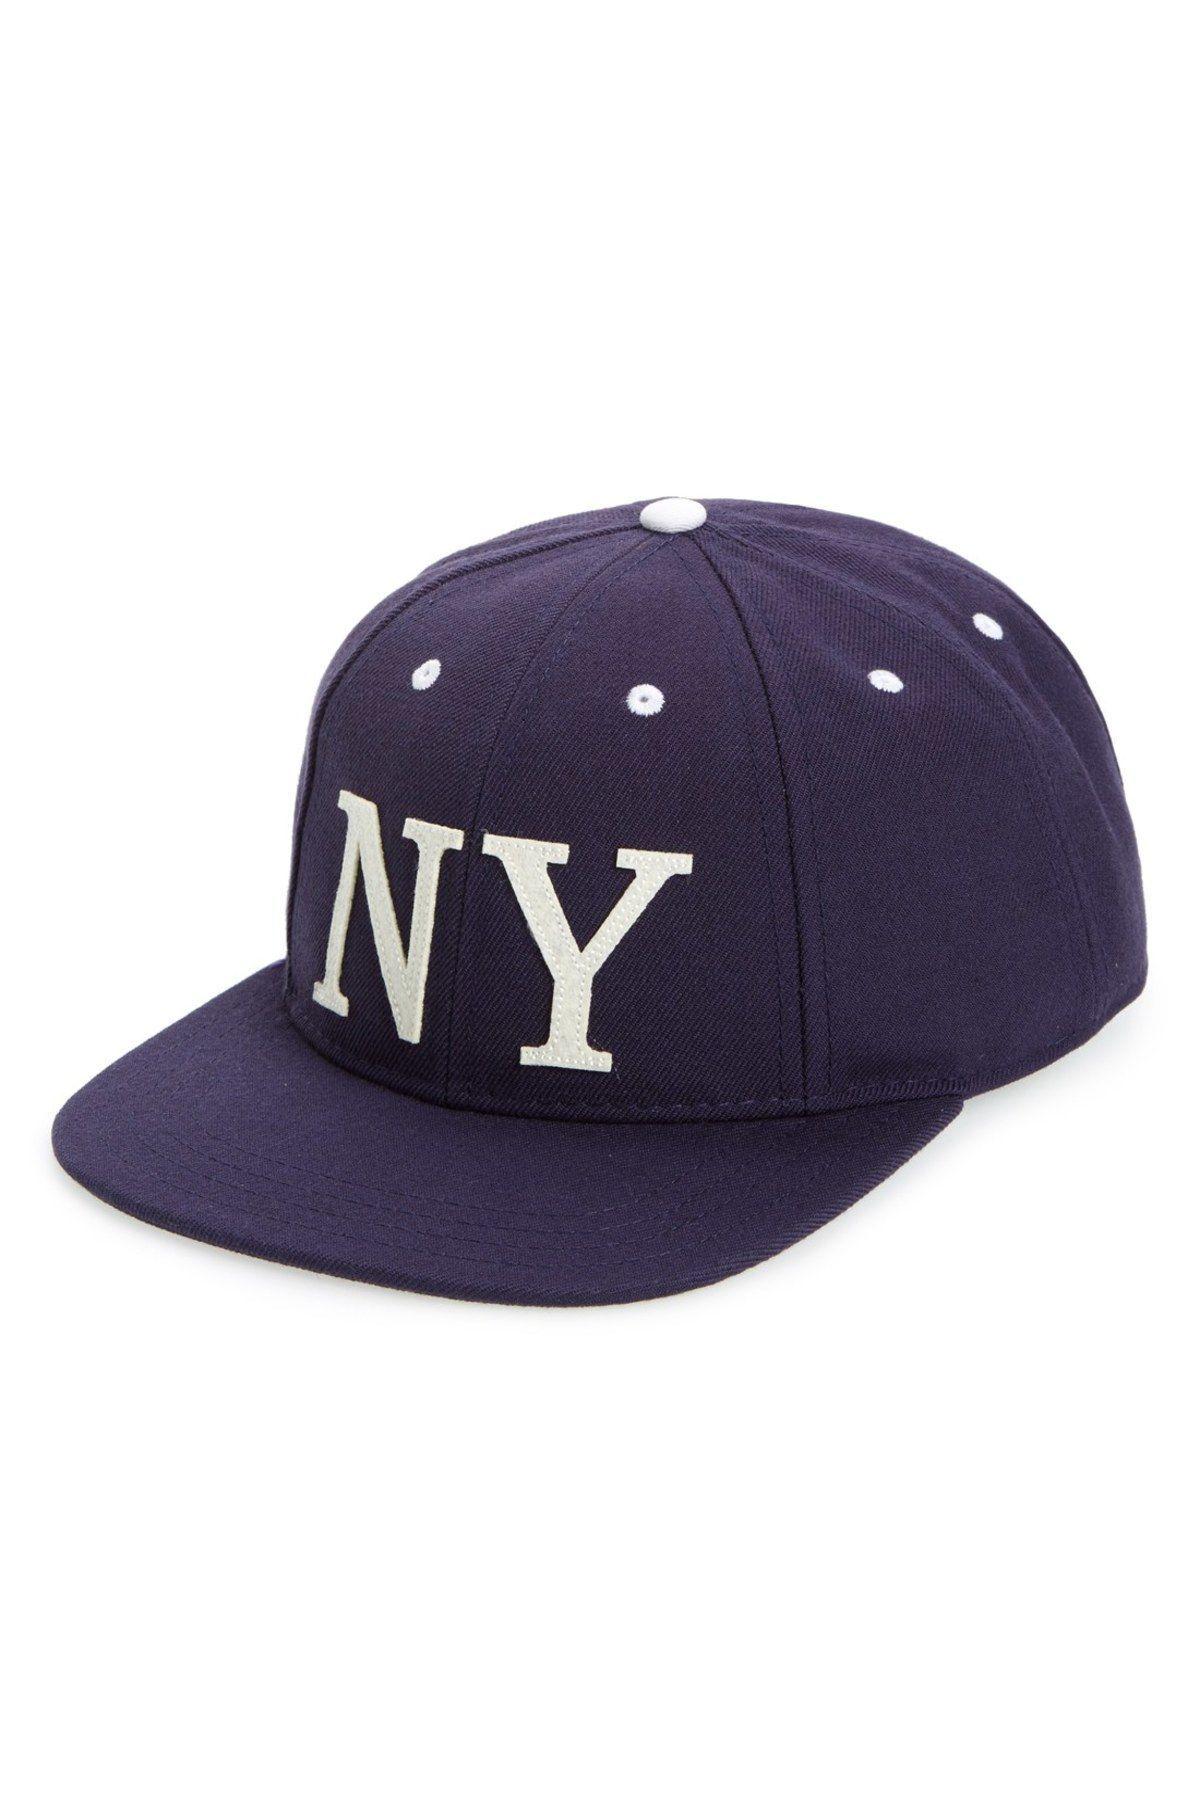 Ace Baseball Cap  11464caaa57